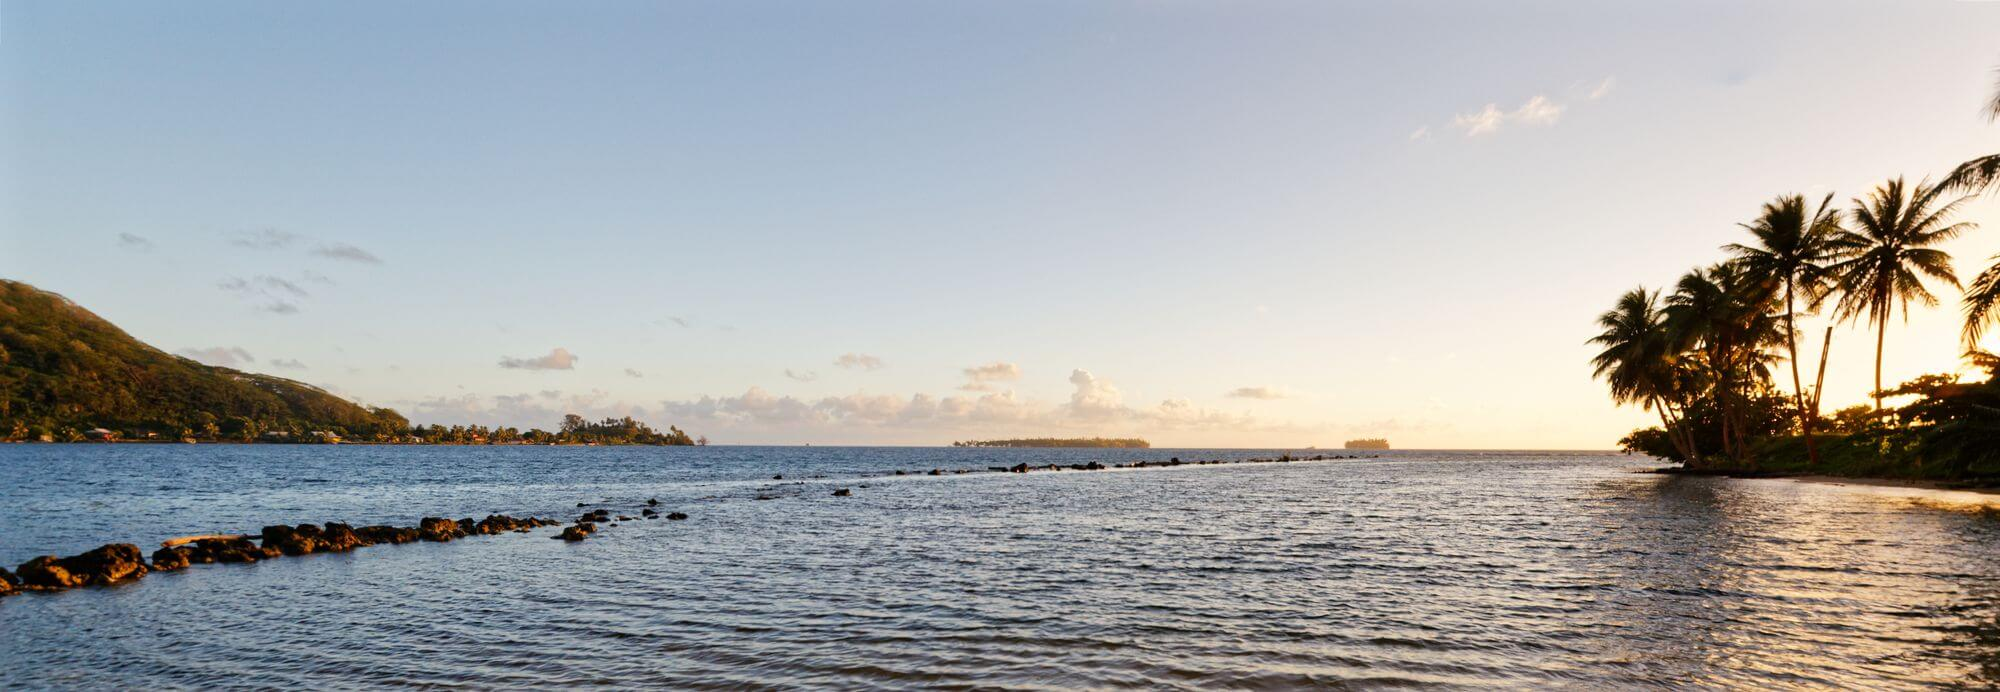 pandémie covid19 polynésie et tahiti